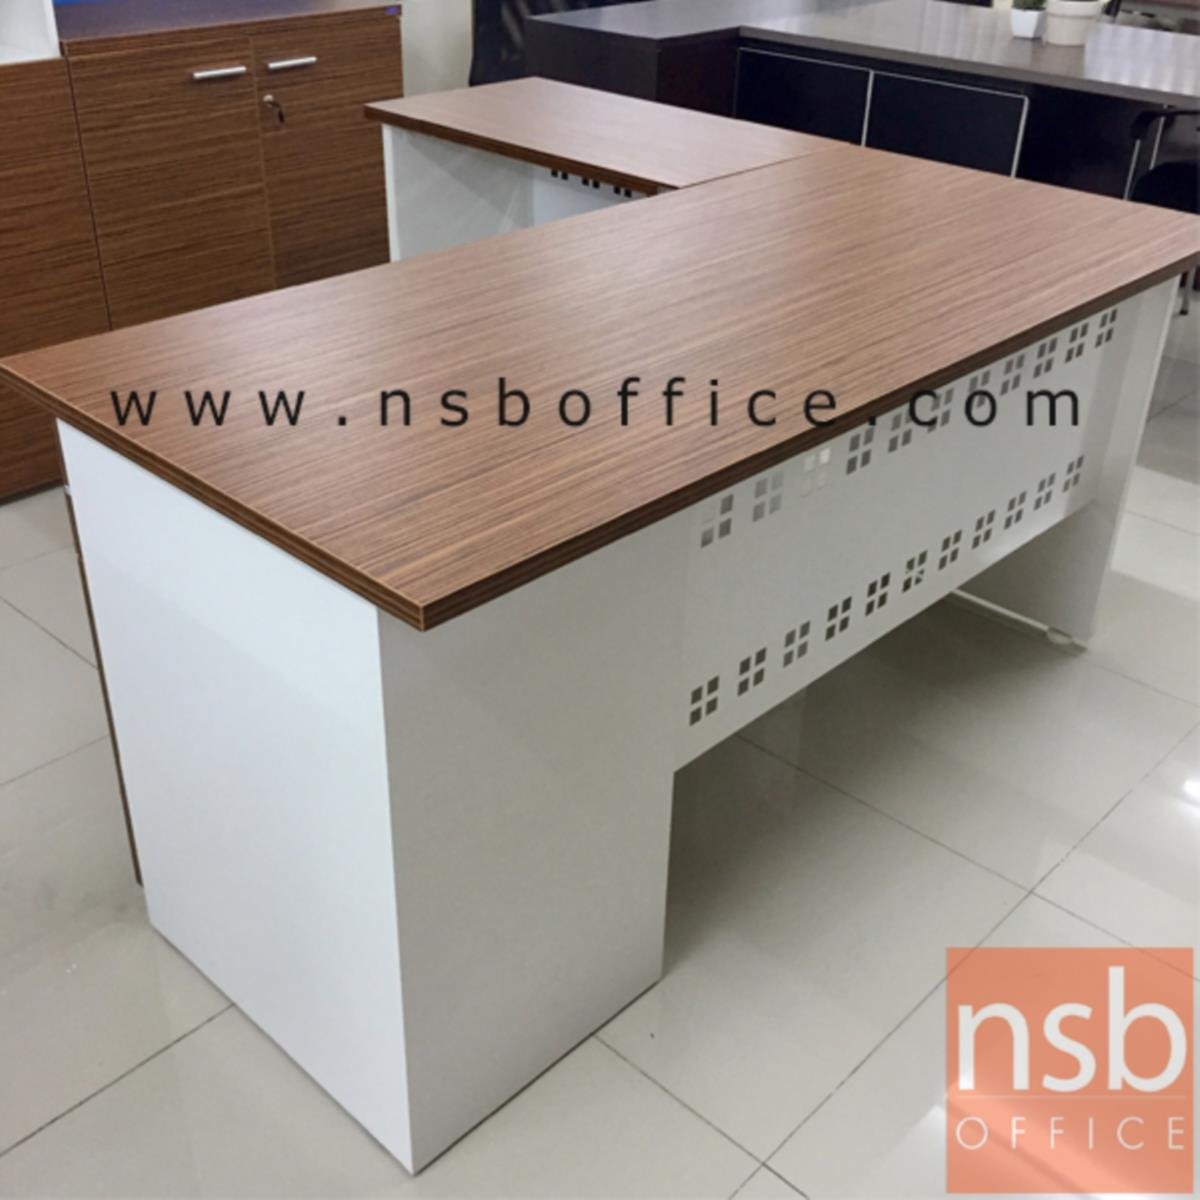 A34A029:โต๊ะทำงานตัวแอล  รุ่น Adornium (อดอร์เนี่ยม) ขนาด 155W1*150W2 cm.  พร้อมบังโป๊เหล็ก สีซีบราโน่-ขาว